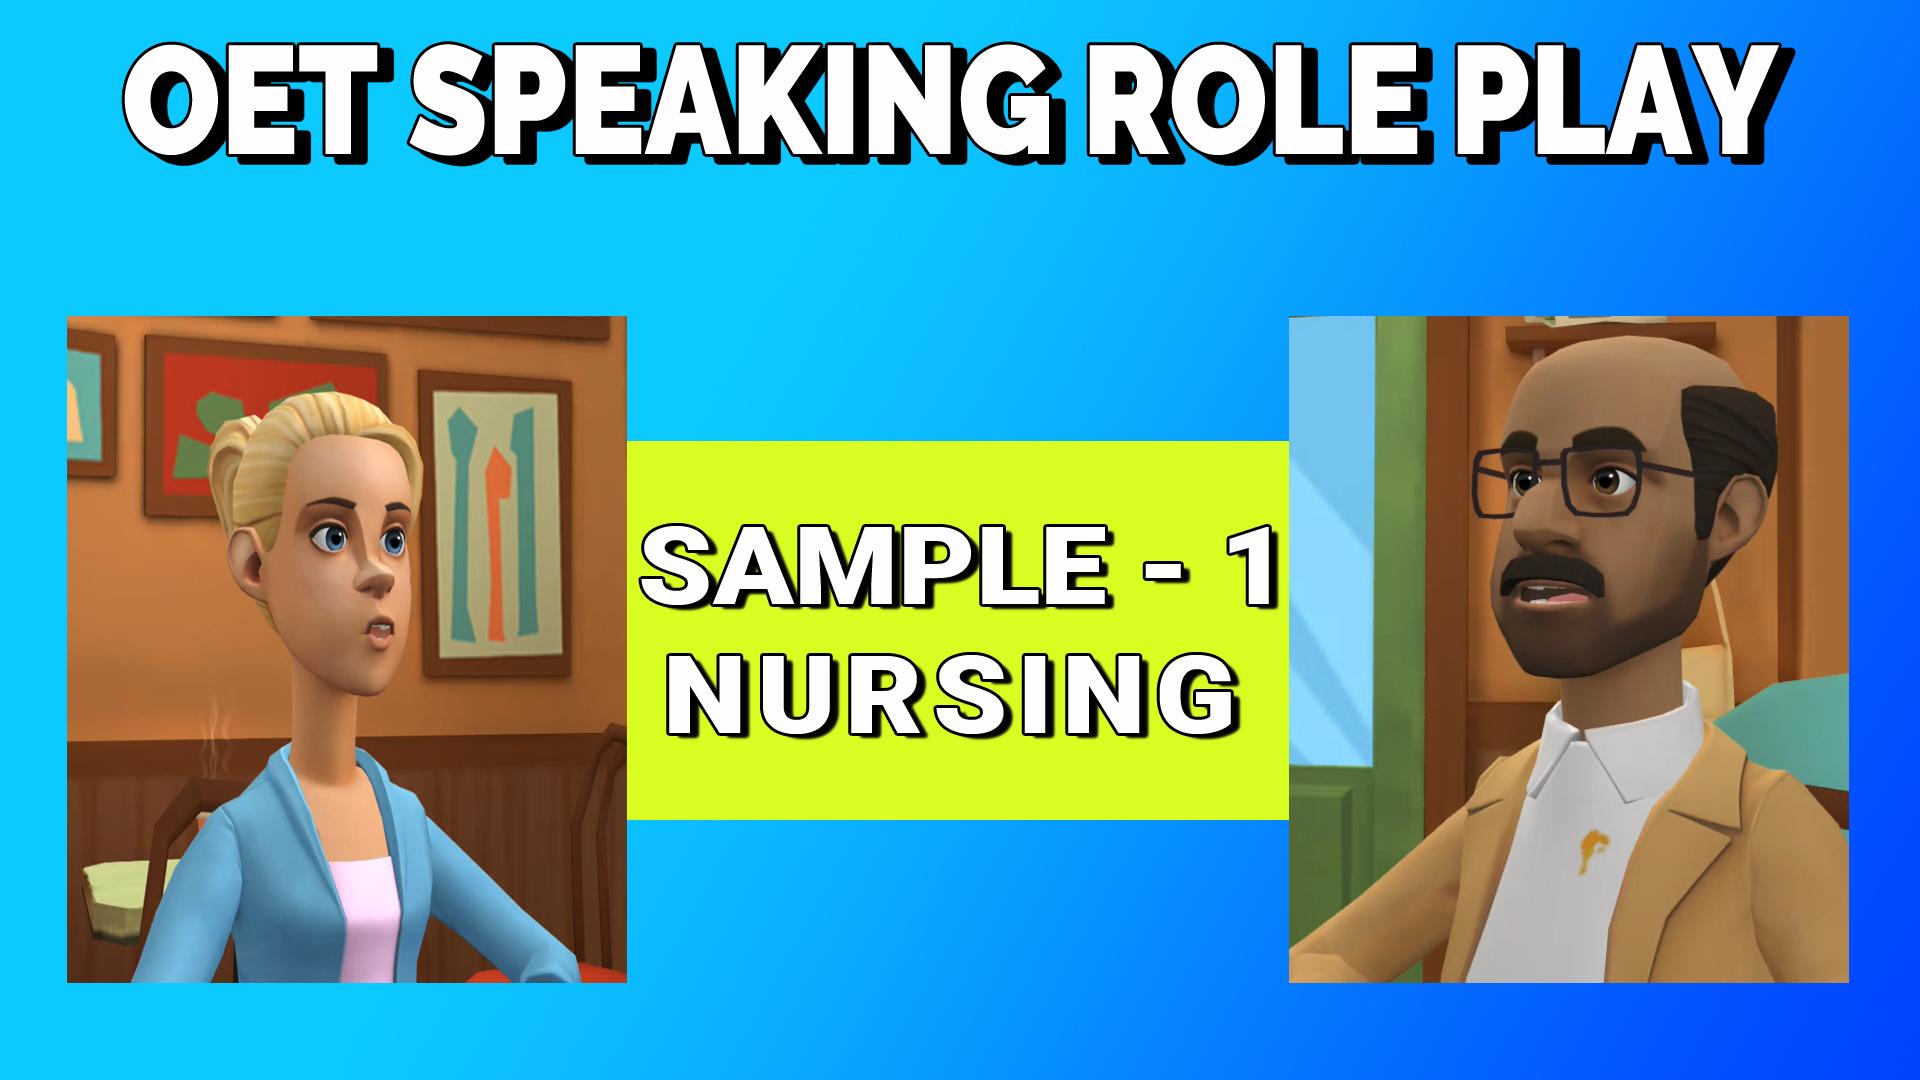 OET Speaking Role Play Sample -1